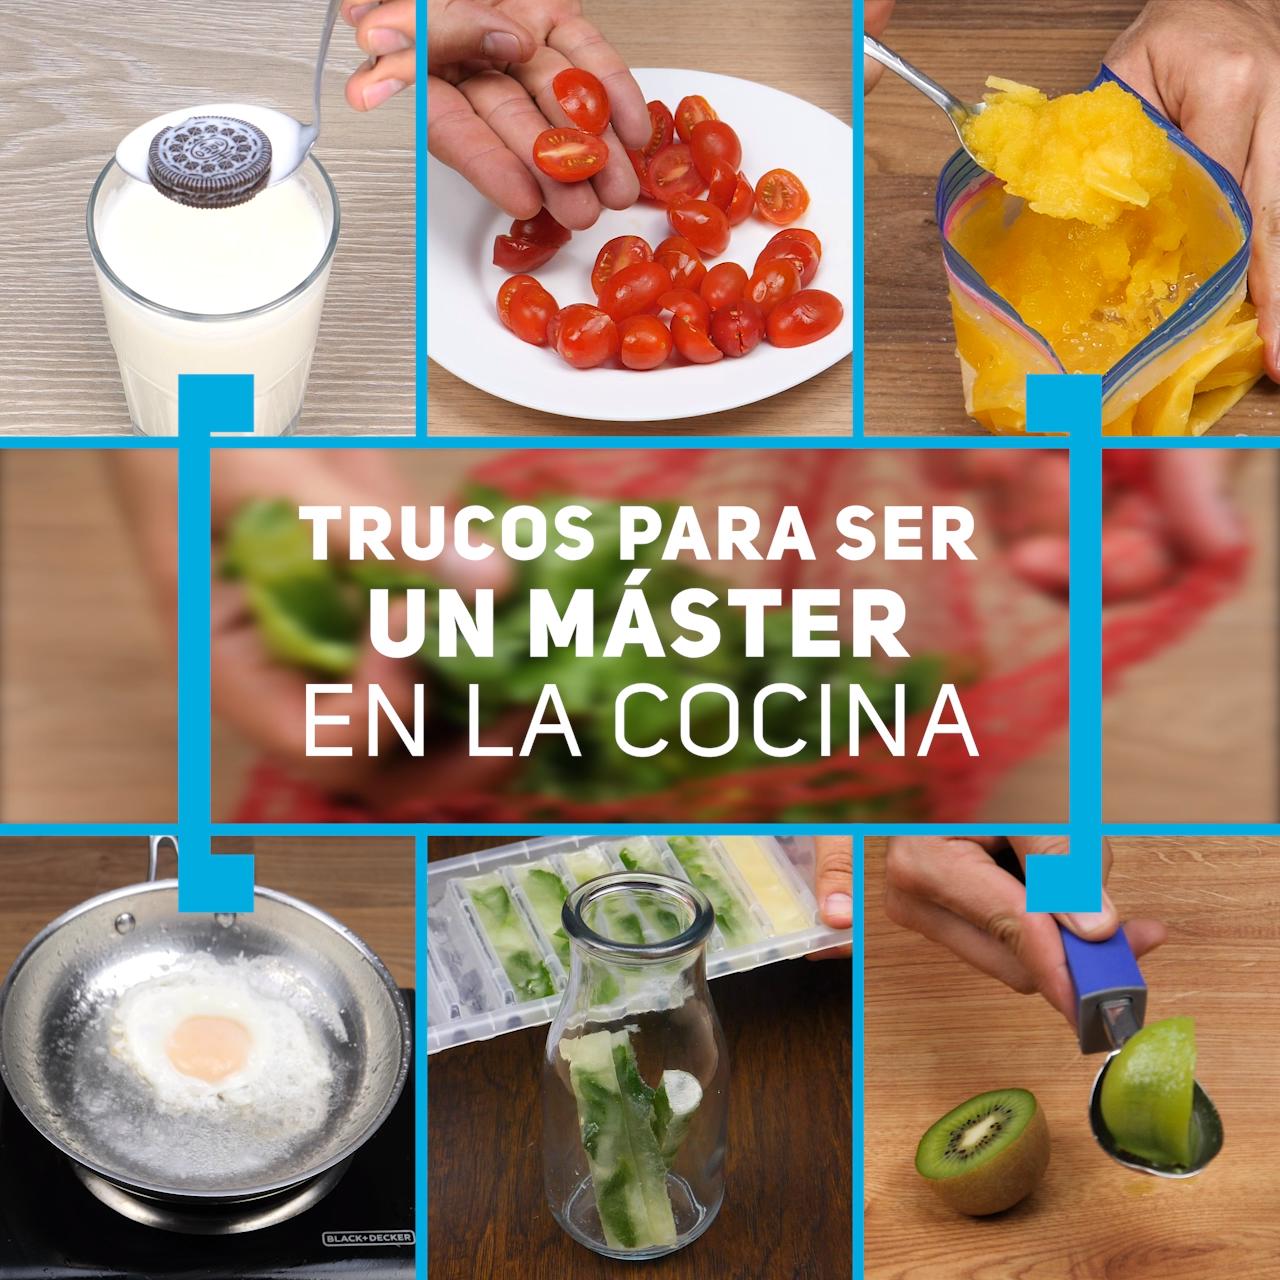 15 Trucos De Cocina Que Te Harán Parecer Un Chef Profesional Video Video Recetas De Limpieza Consejos De Cocina Trucos